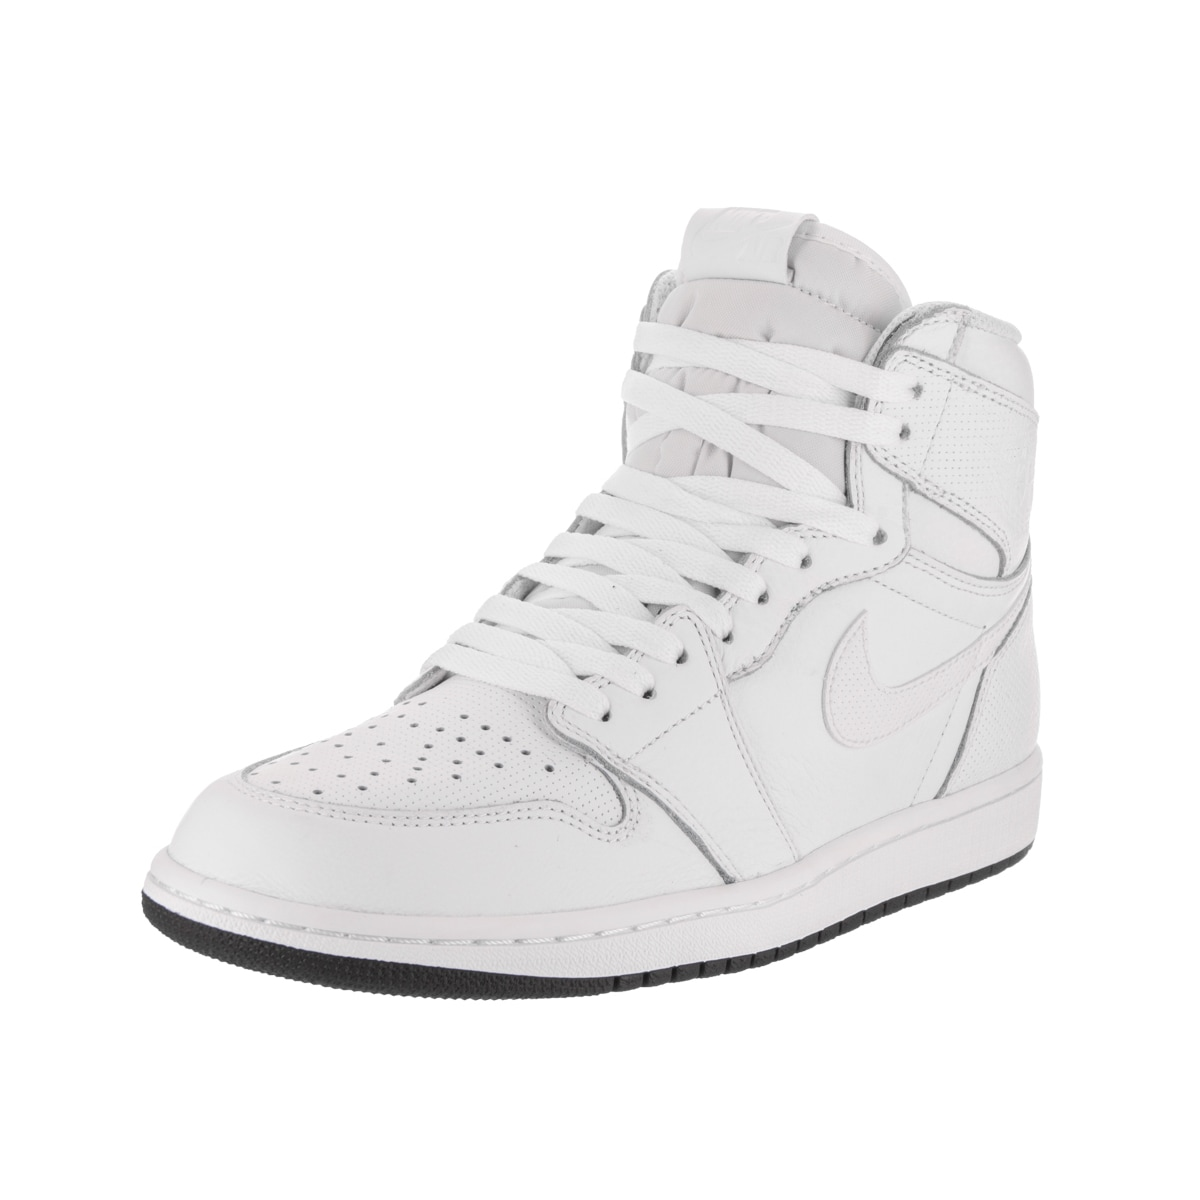 9ee73df9 Shop Nike Jordan Men's Air Jordan 1 Retro High OG Basketball Shoe ...